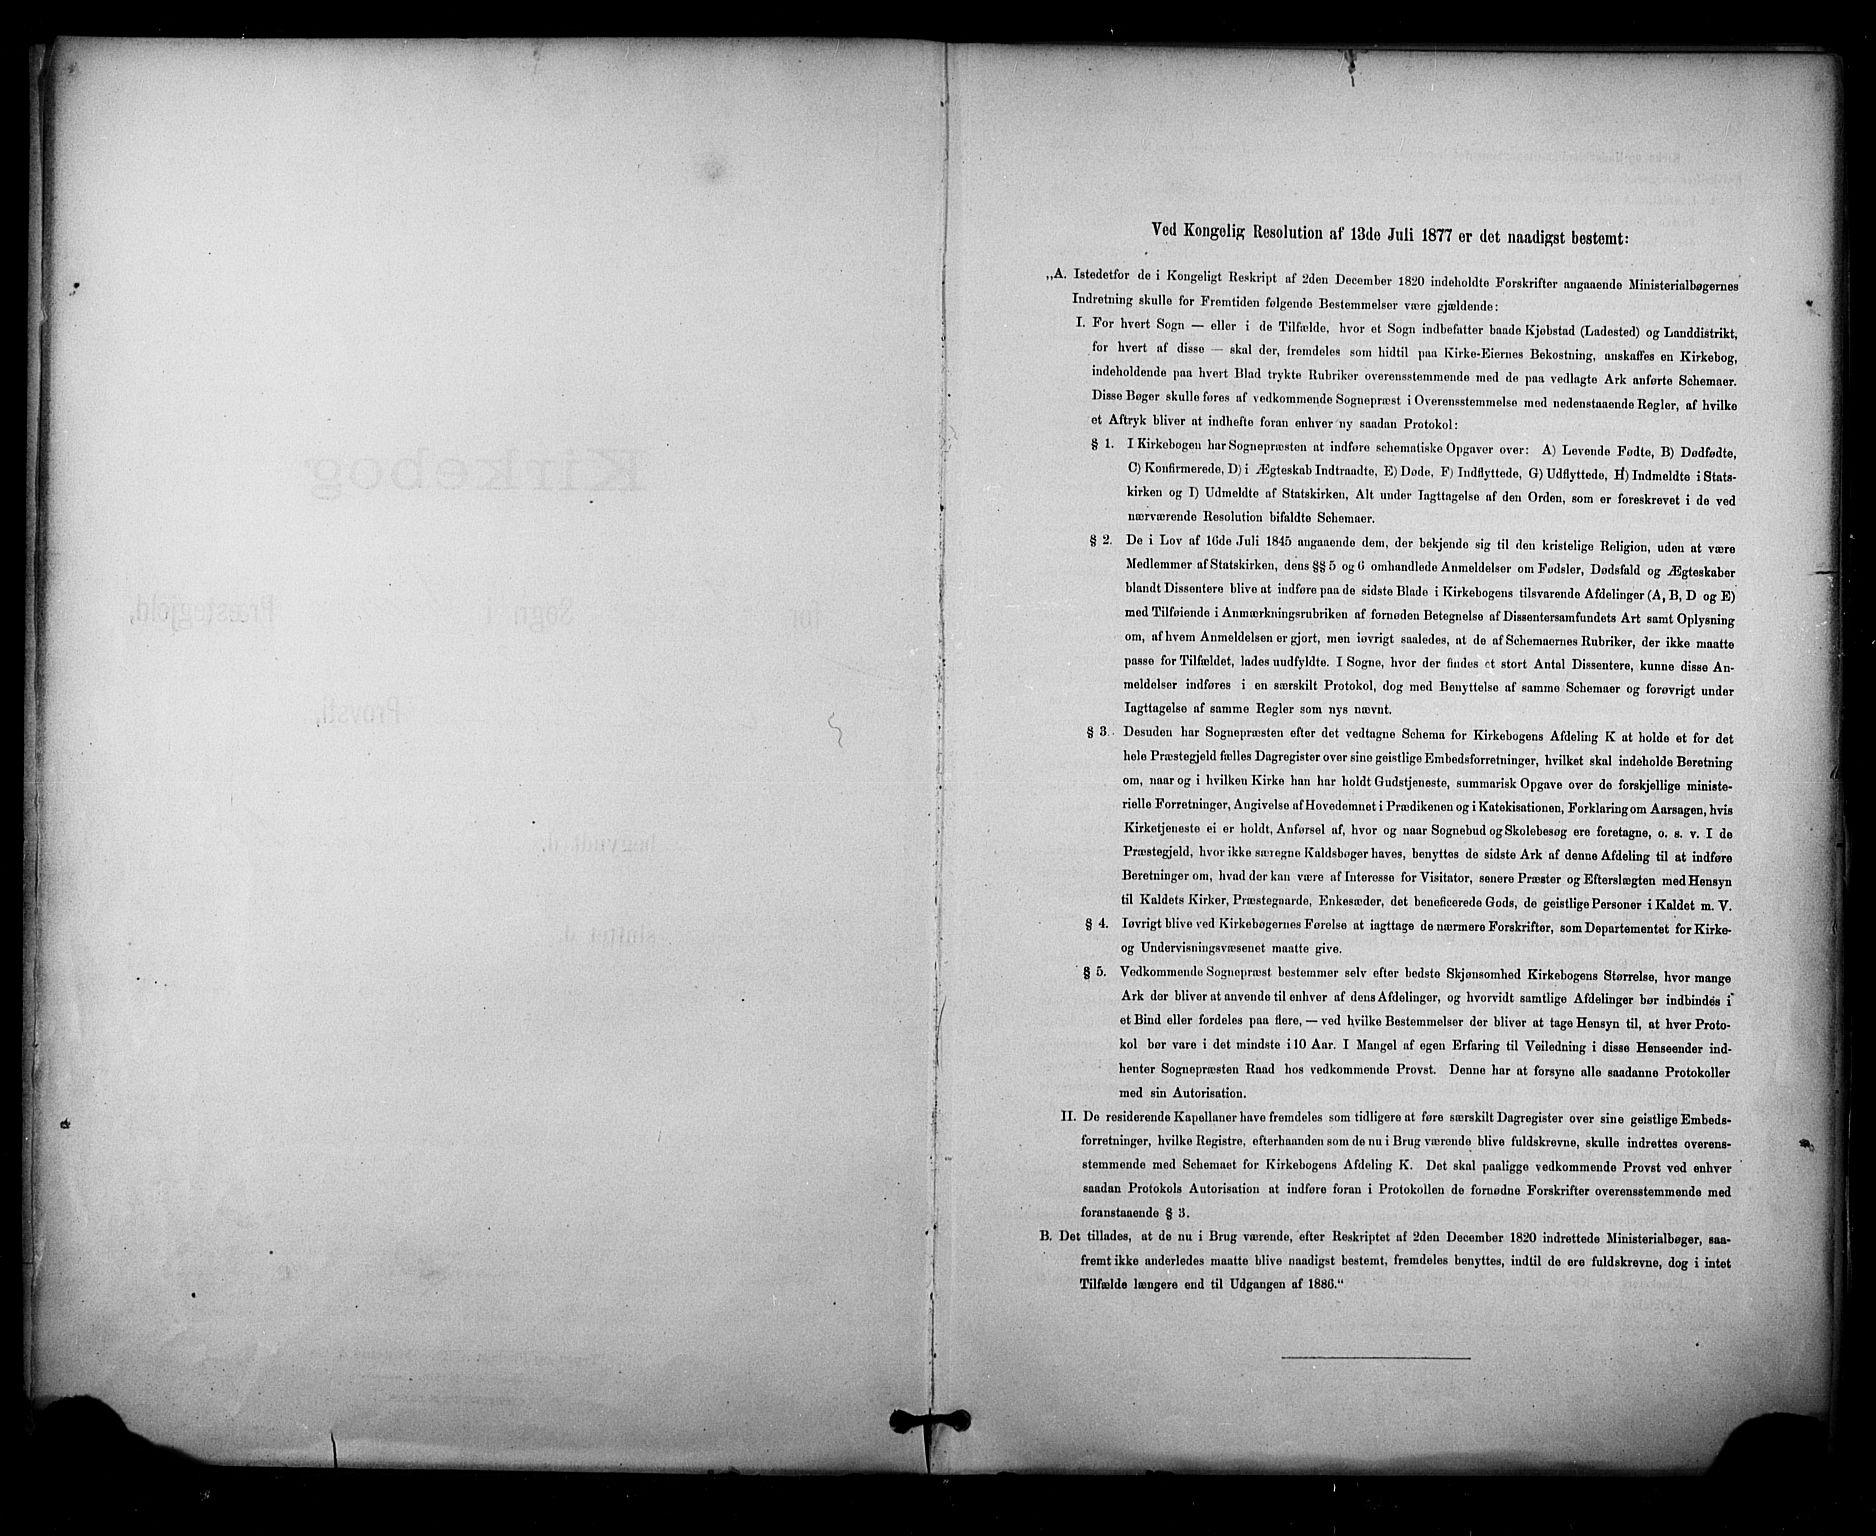 SAKO, Sauherad kirkebøker, F/Fa/L0009: Ministerialbok nr. I 9, 1887-1912